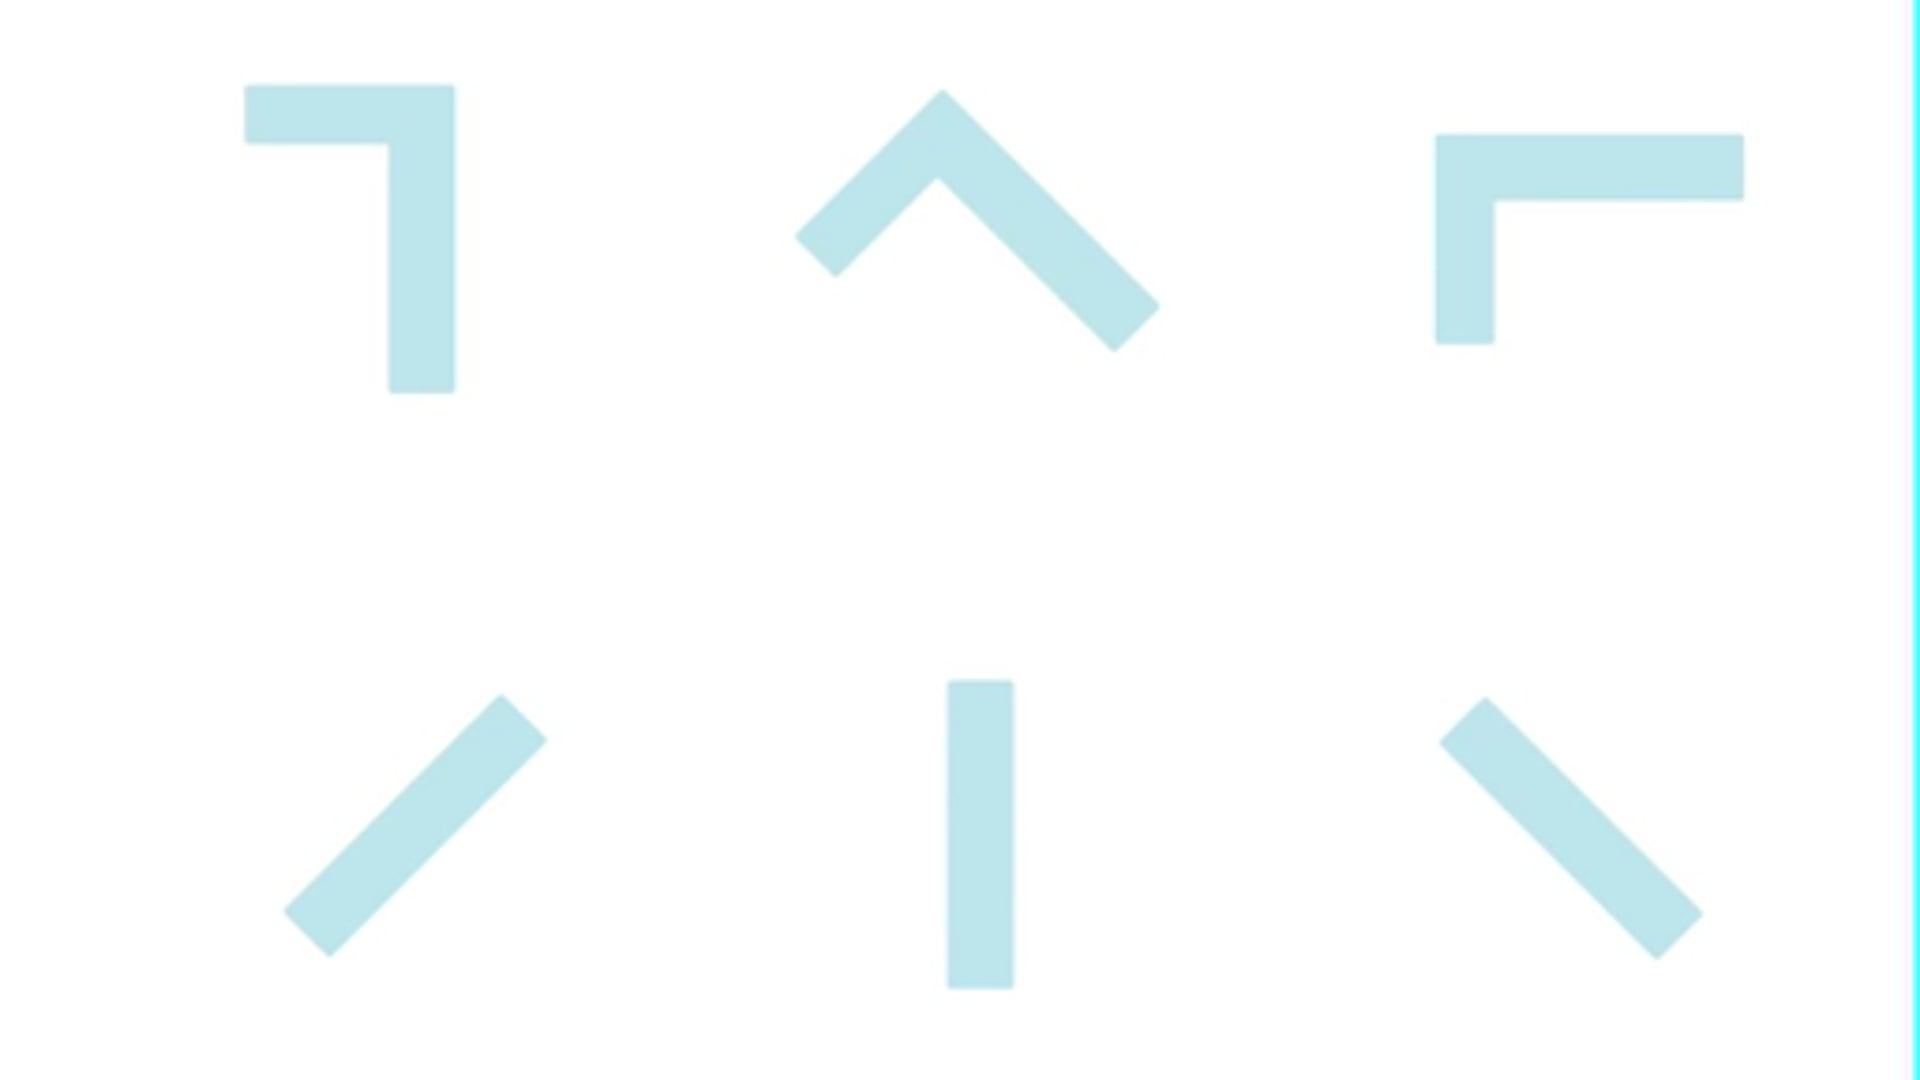 KLIK festival logo animated